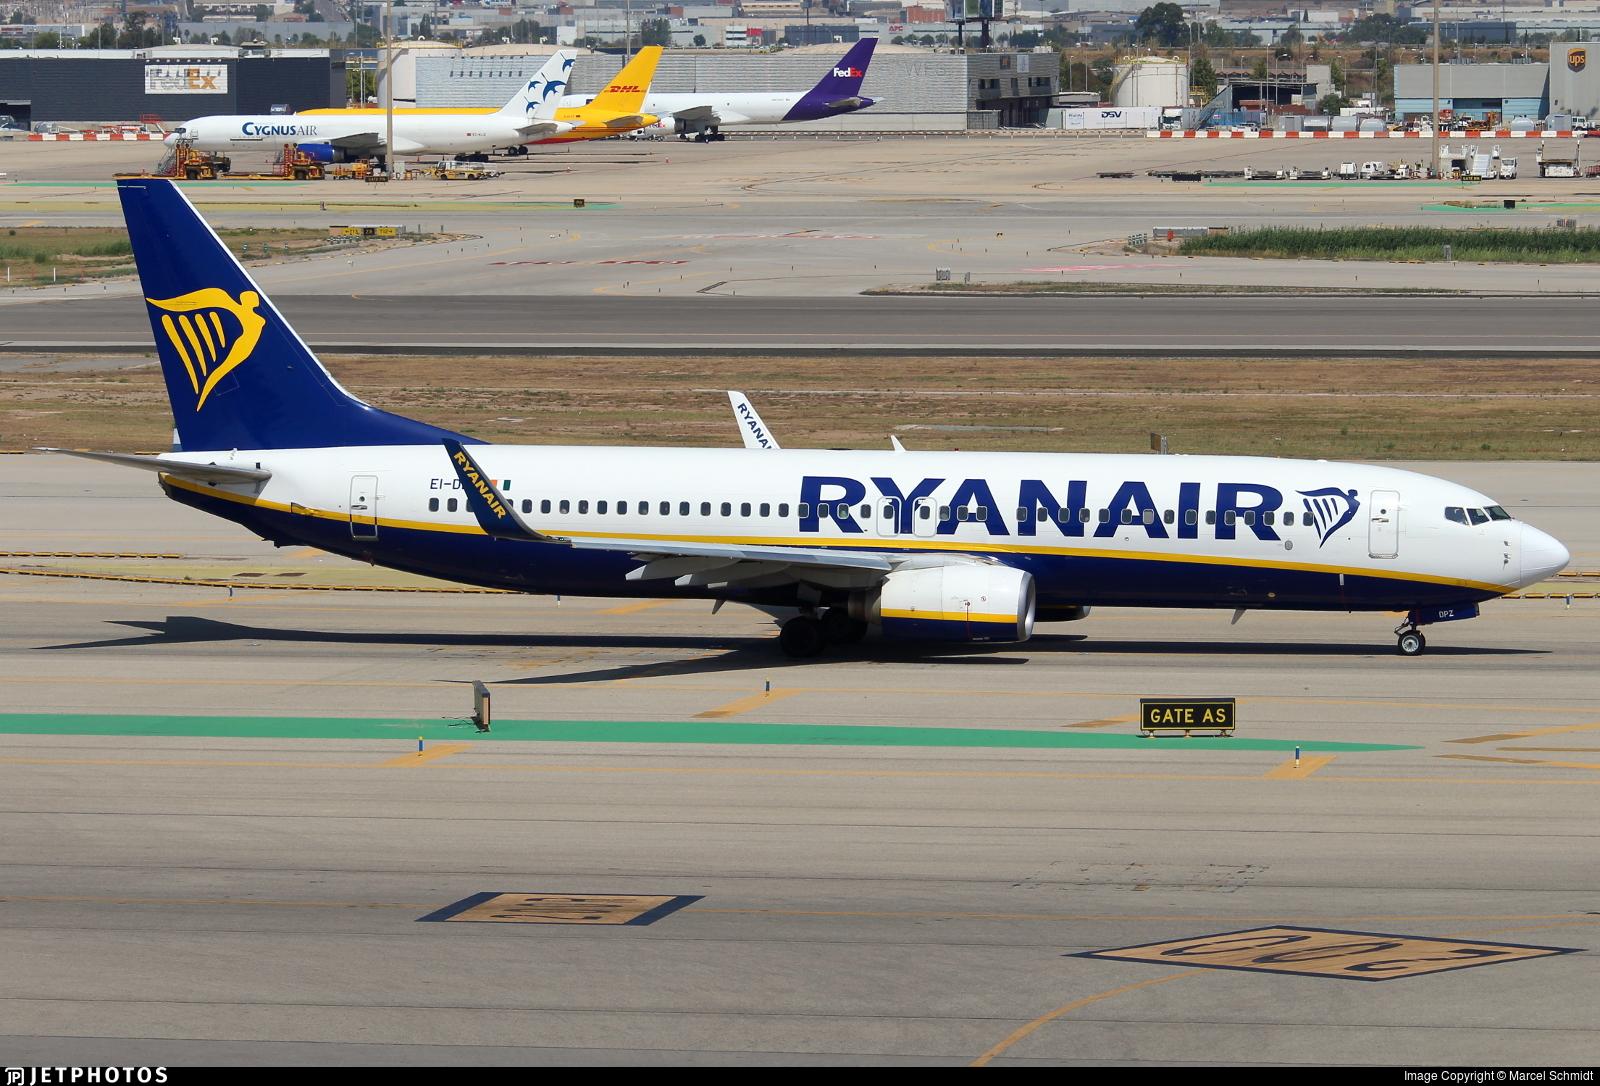 EI-DPZ - Boeing 737-8AS - Ryanair